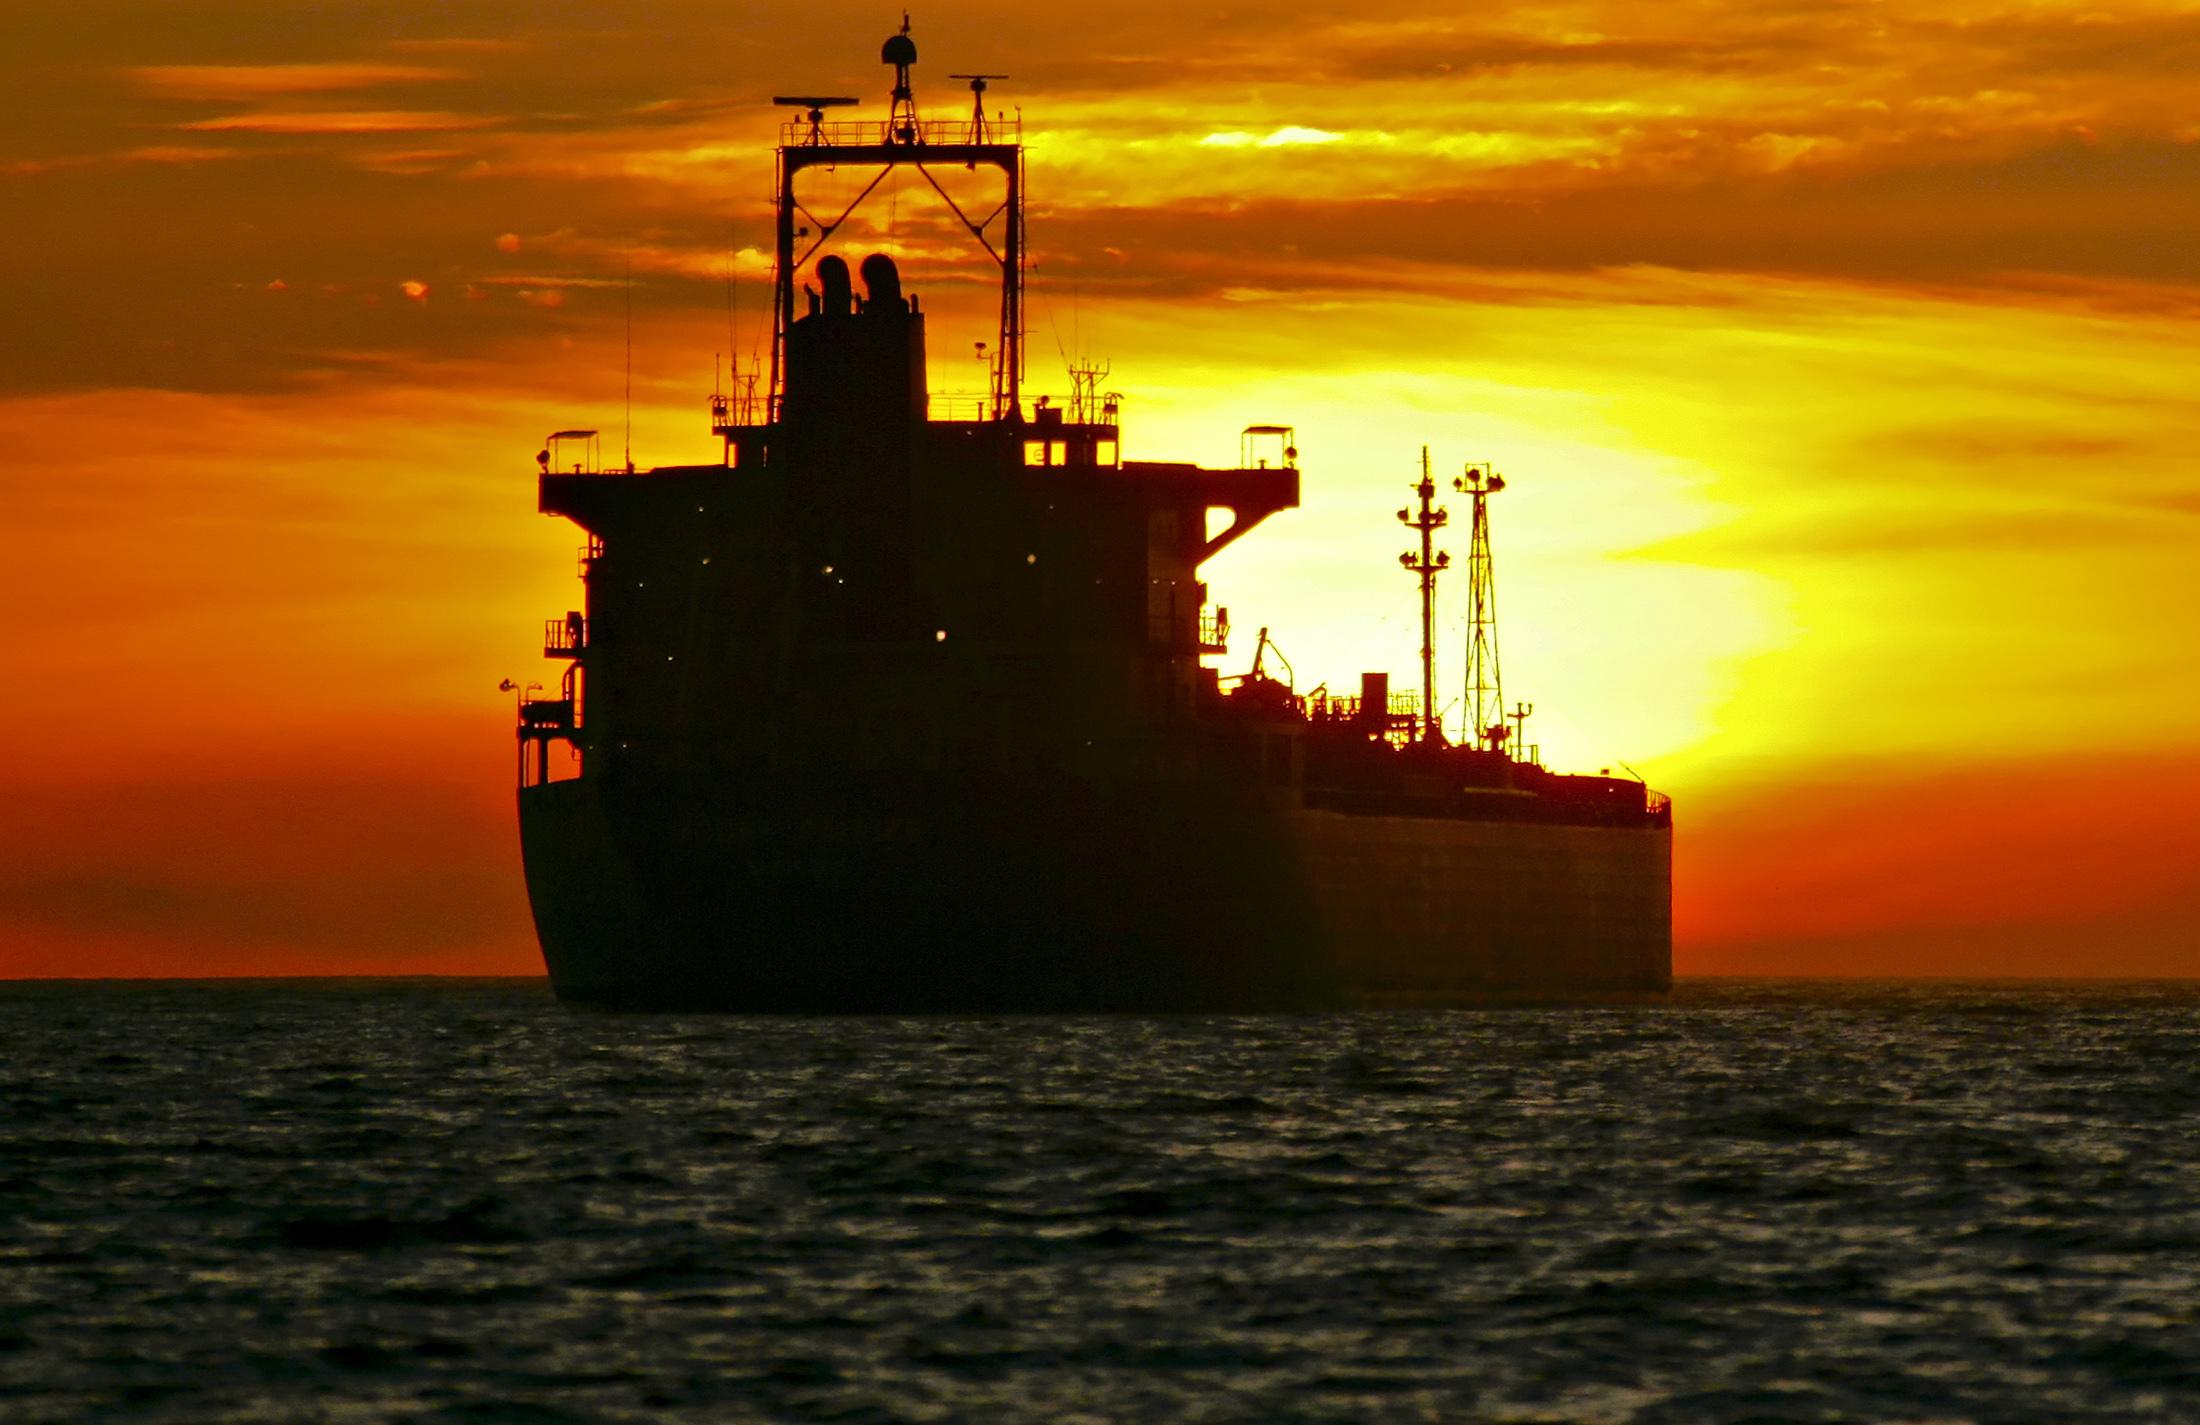 An oil tanker is anchored near the Port of Long Beach, California, U.S. Photographer: Tim Rue/Bloomberg